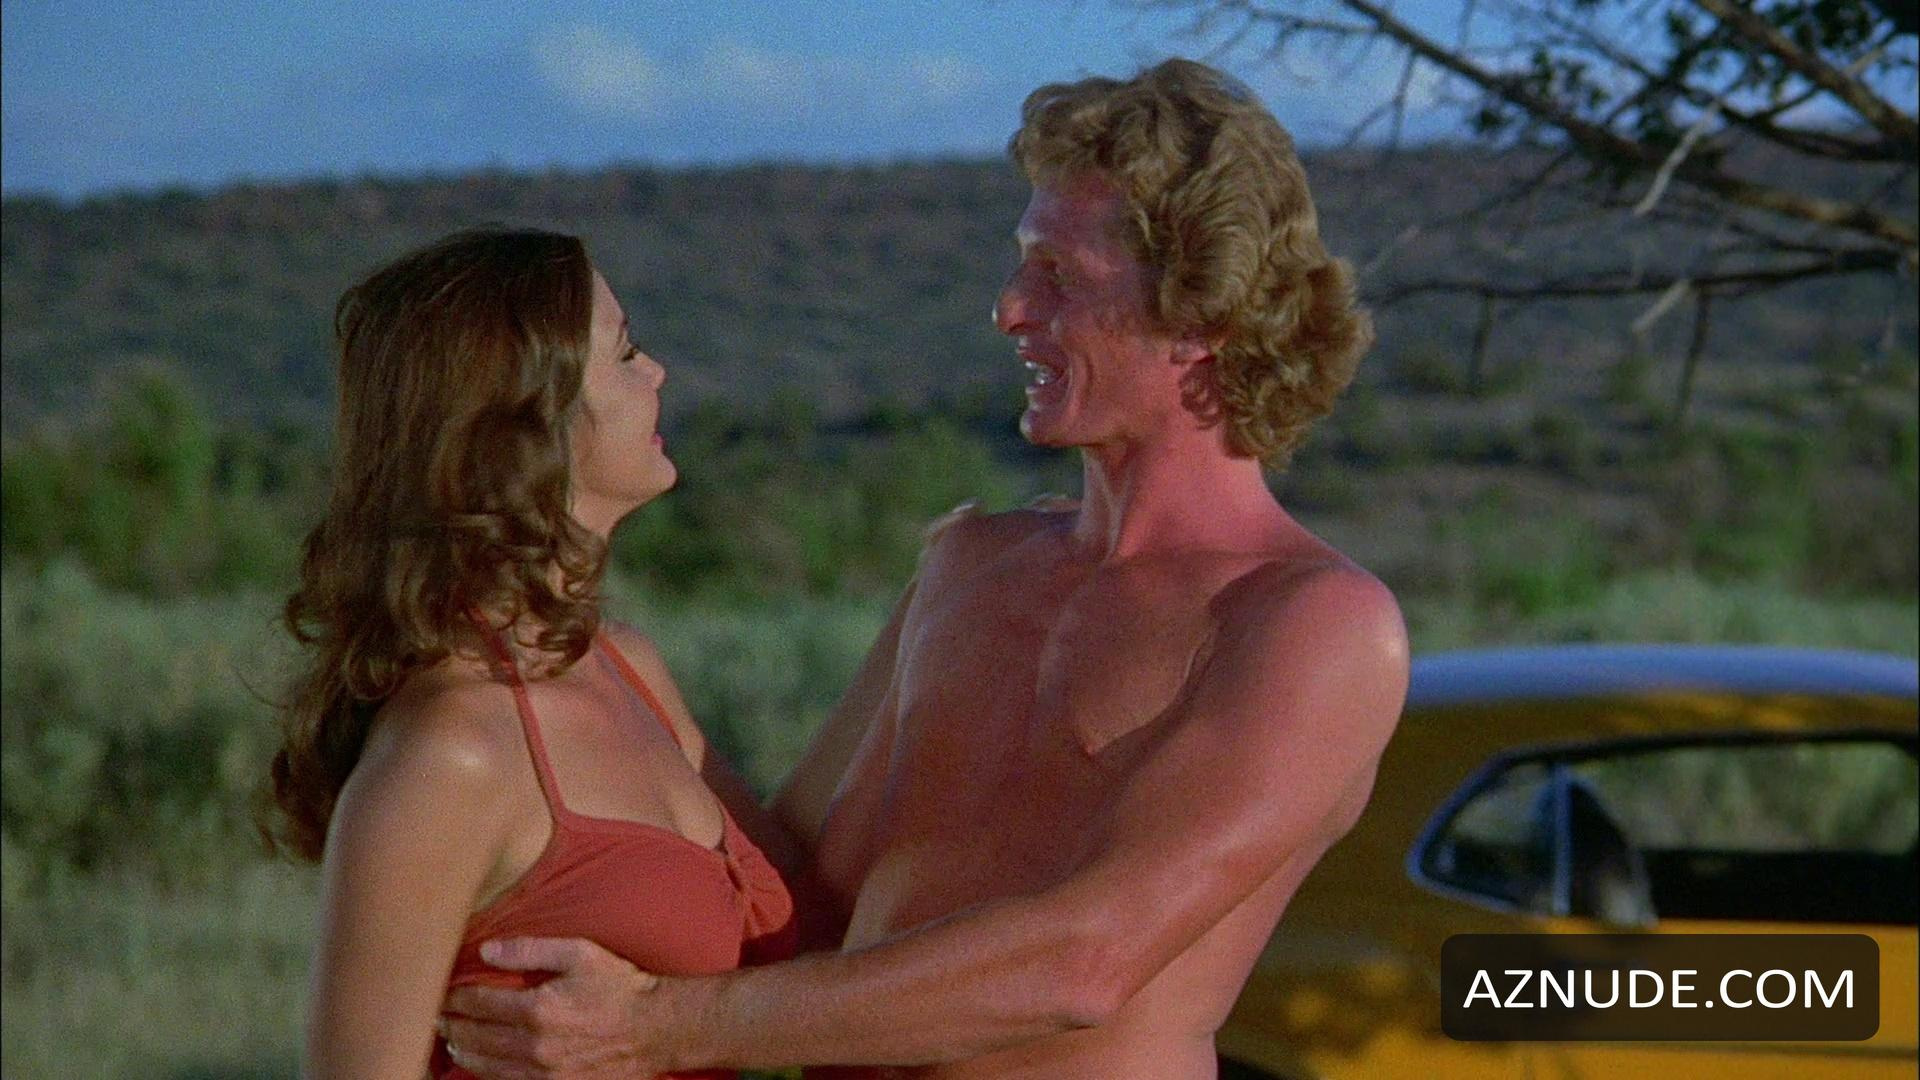 italian-girls-bobbie-jo-and-the-outlaw-nude-scenes-tits-lesbian-scissoring